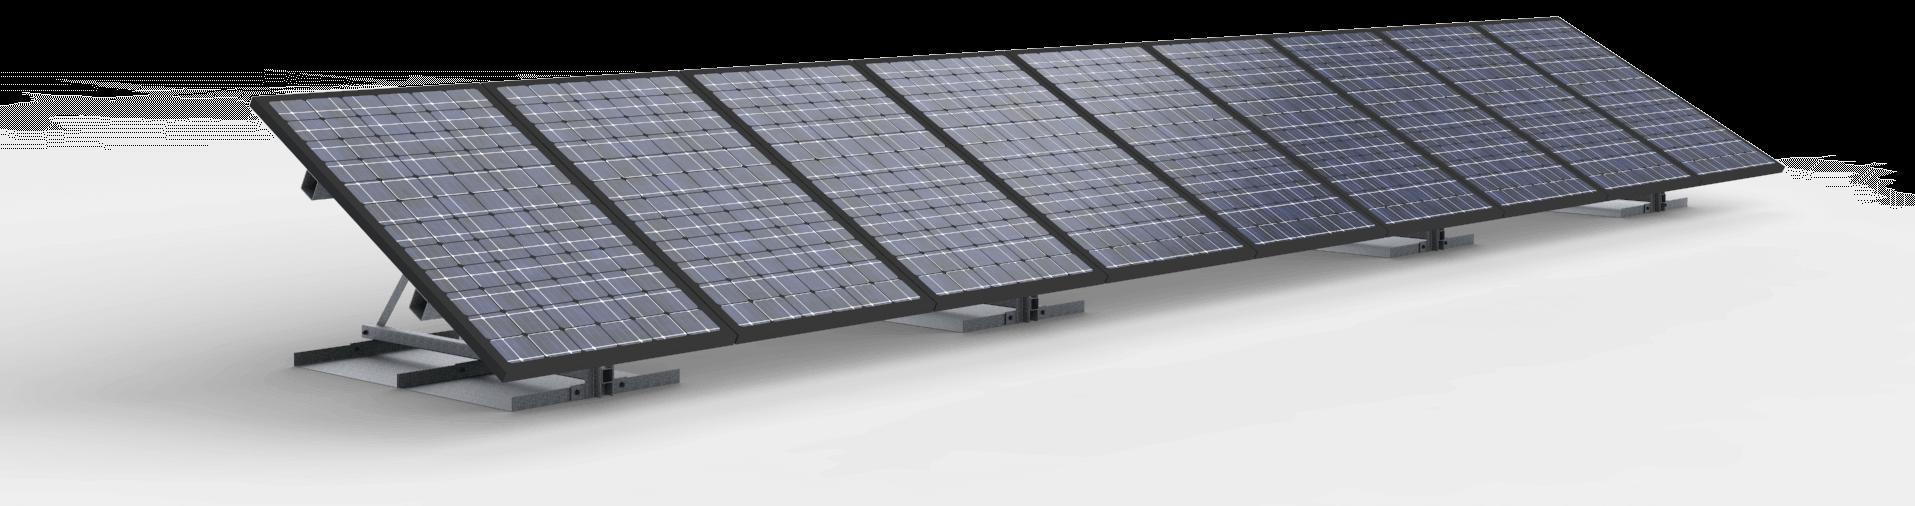 Vrije veldopstelling 9 zonnepanelen